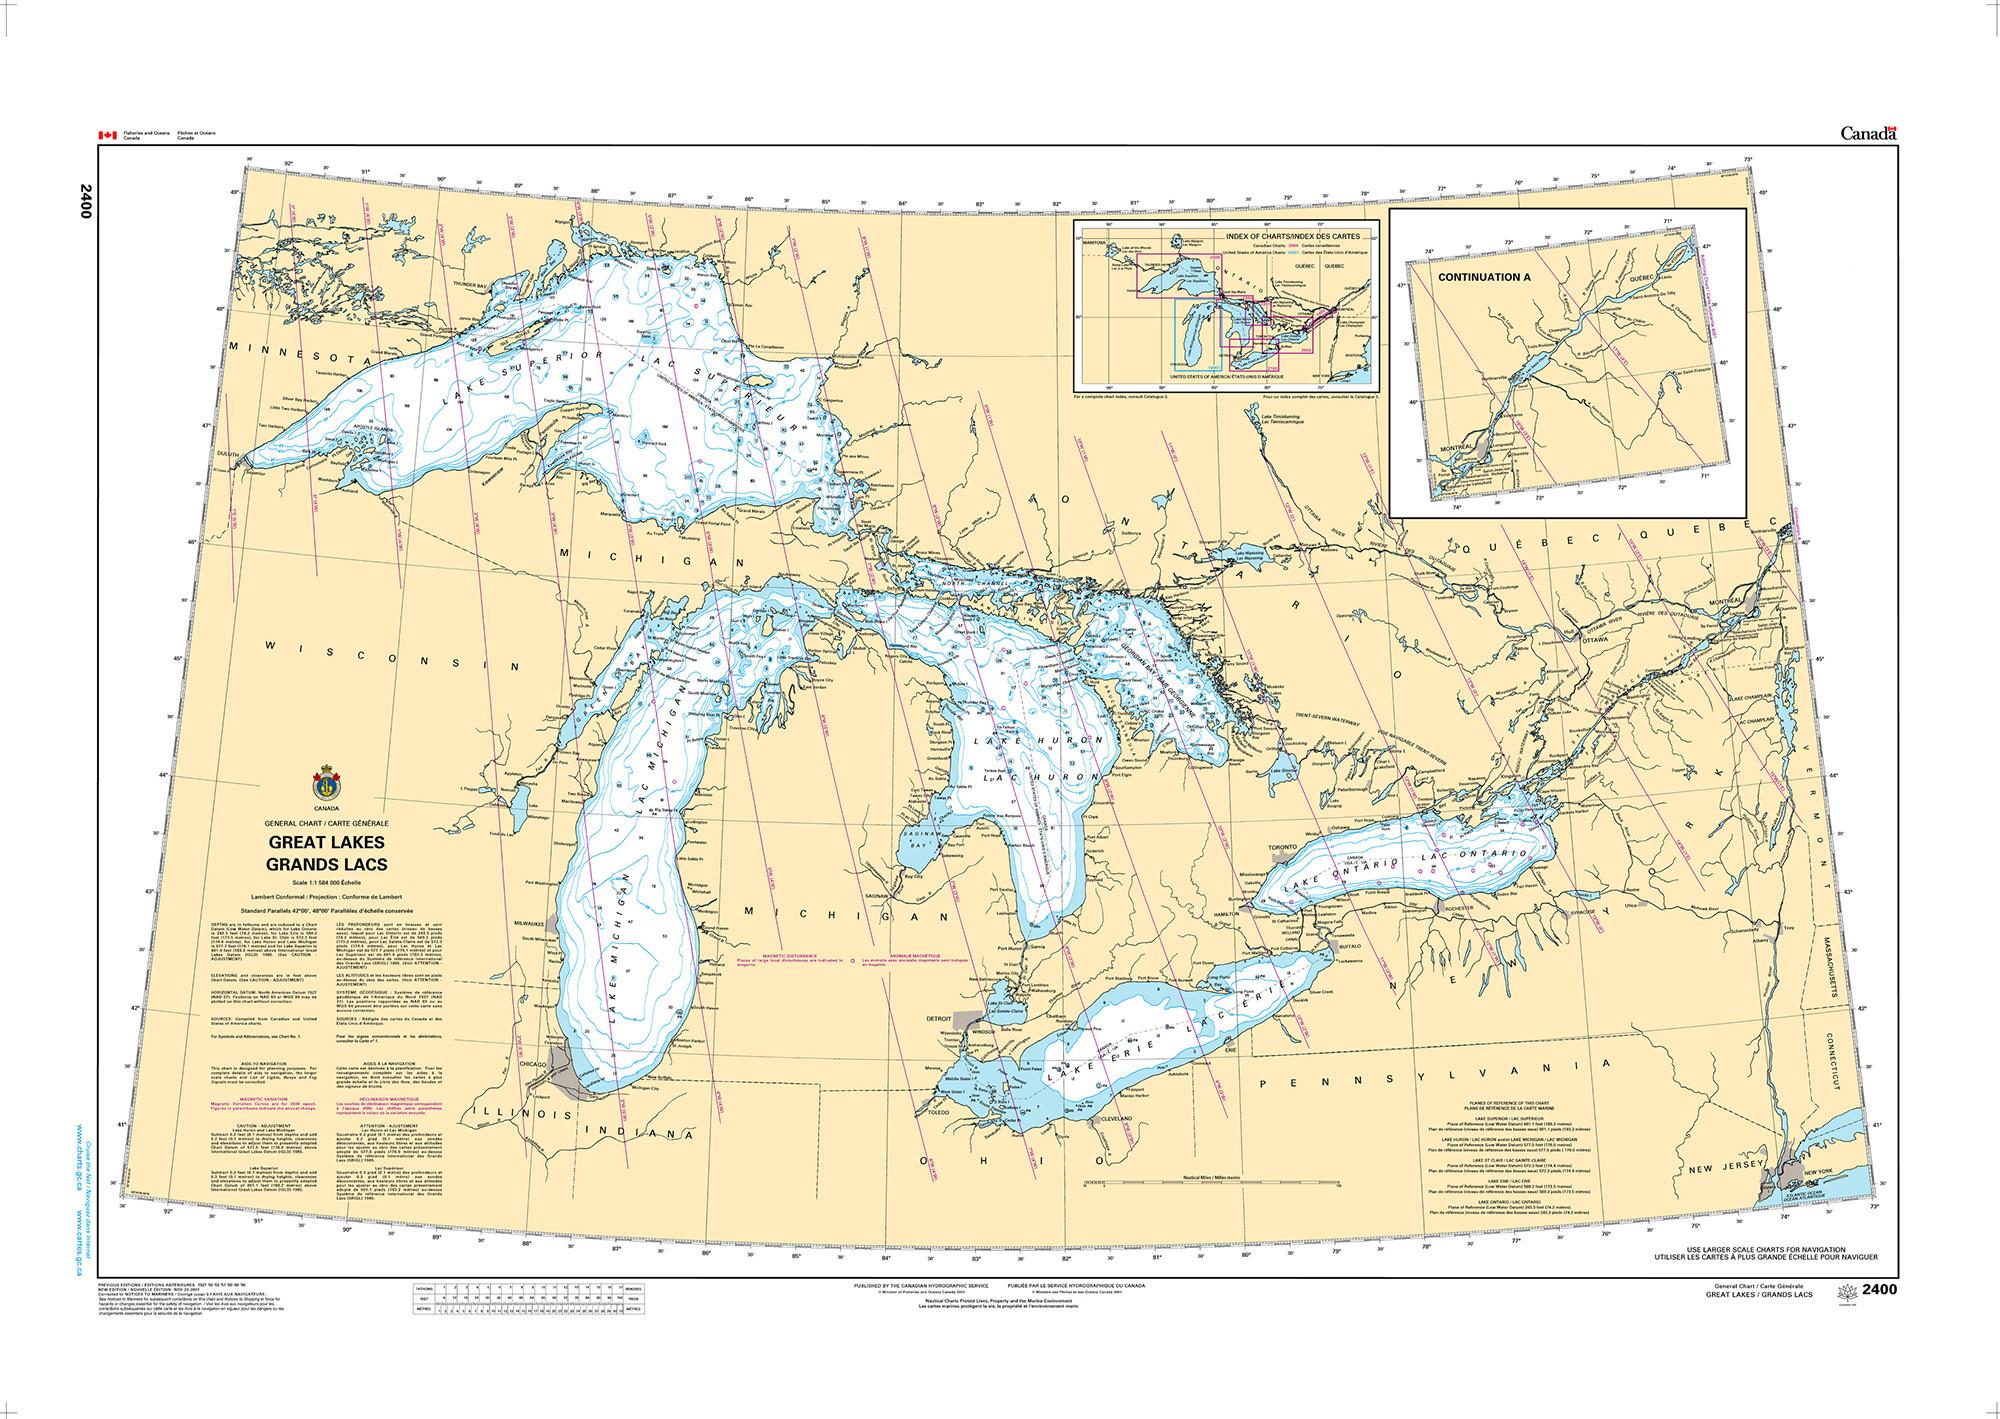 CHS Nautical Chart - CHS2400 Great Lakes/Grands Lacs